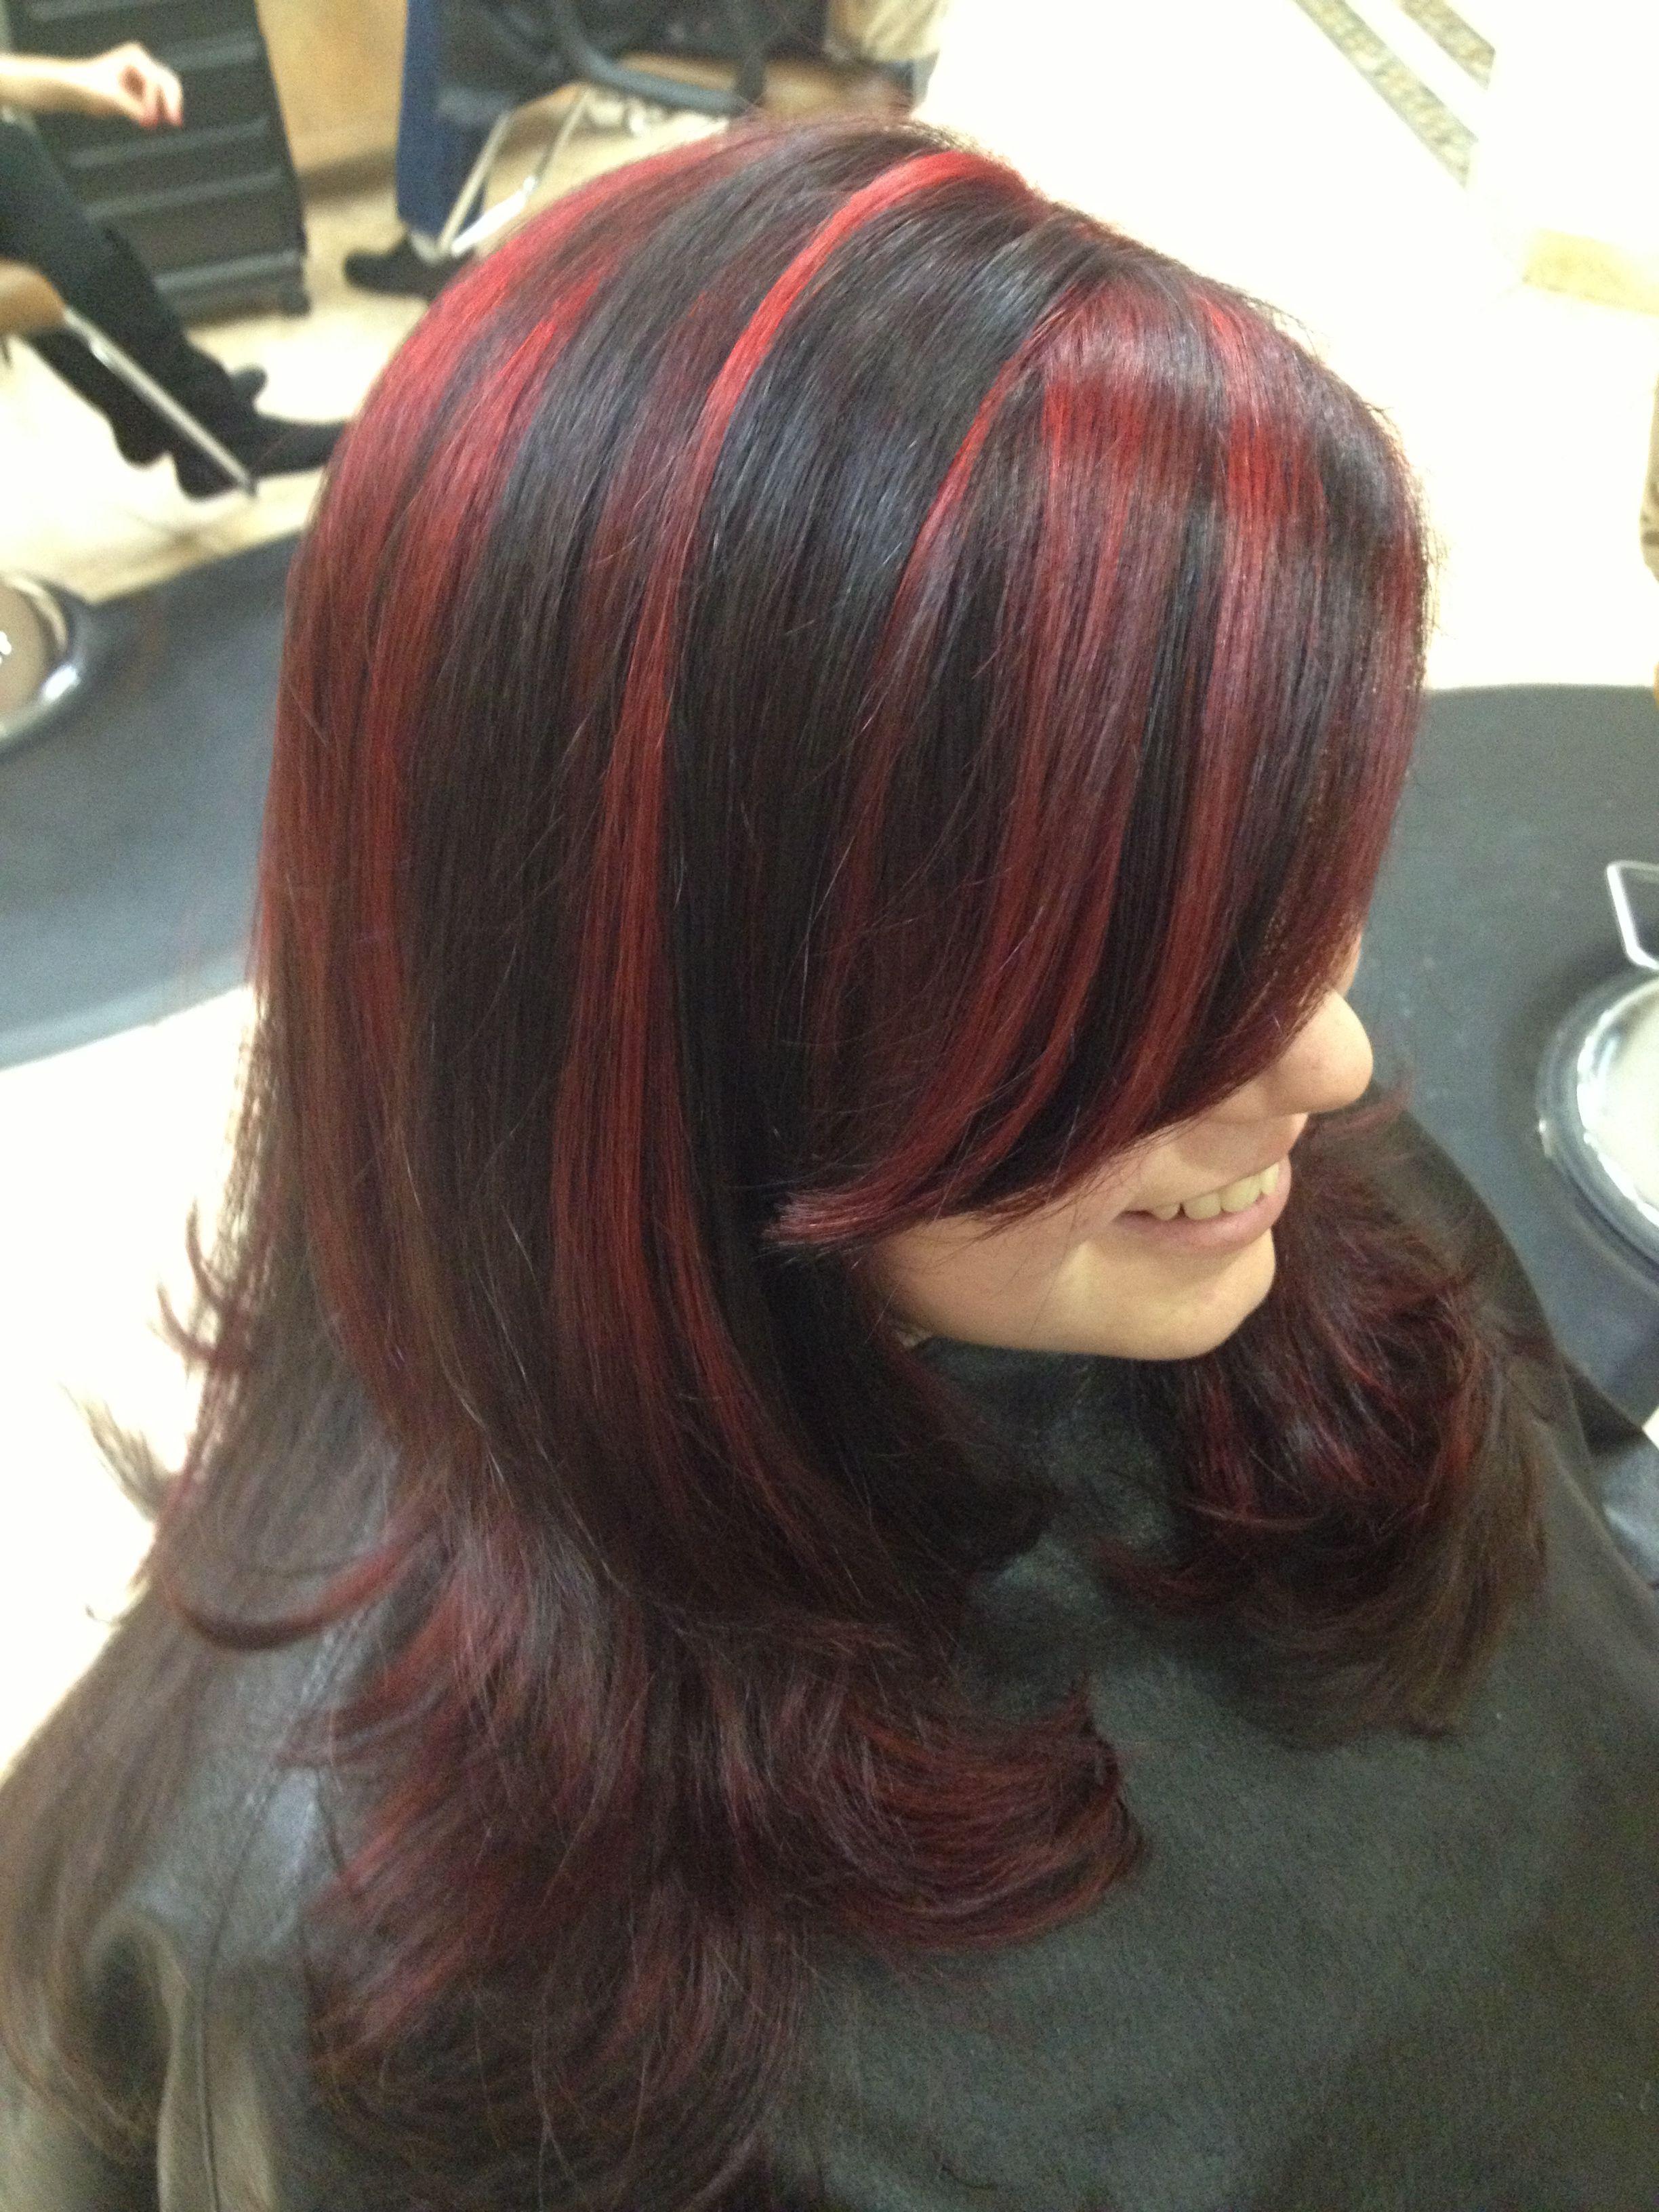 Pin By Salon Samaria On Joanna Madison Black Hair With Highlights Diy Highlights Hair Black Hair With Red Highlights